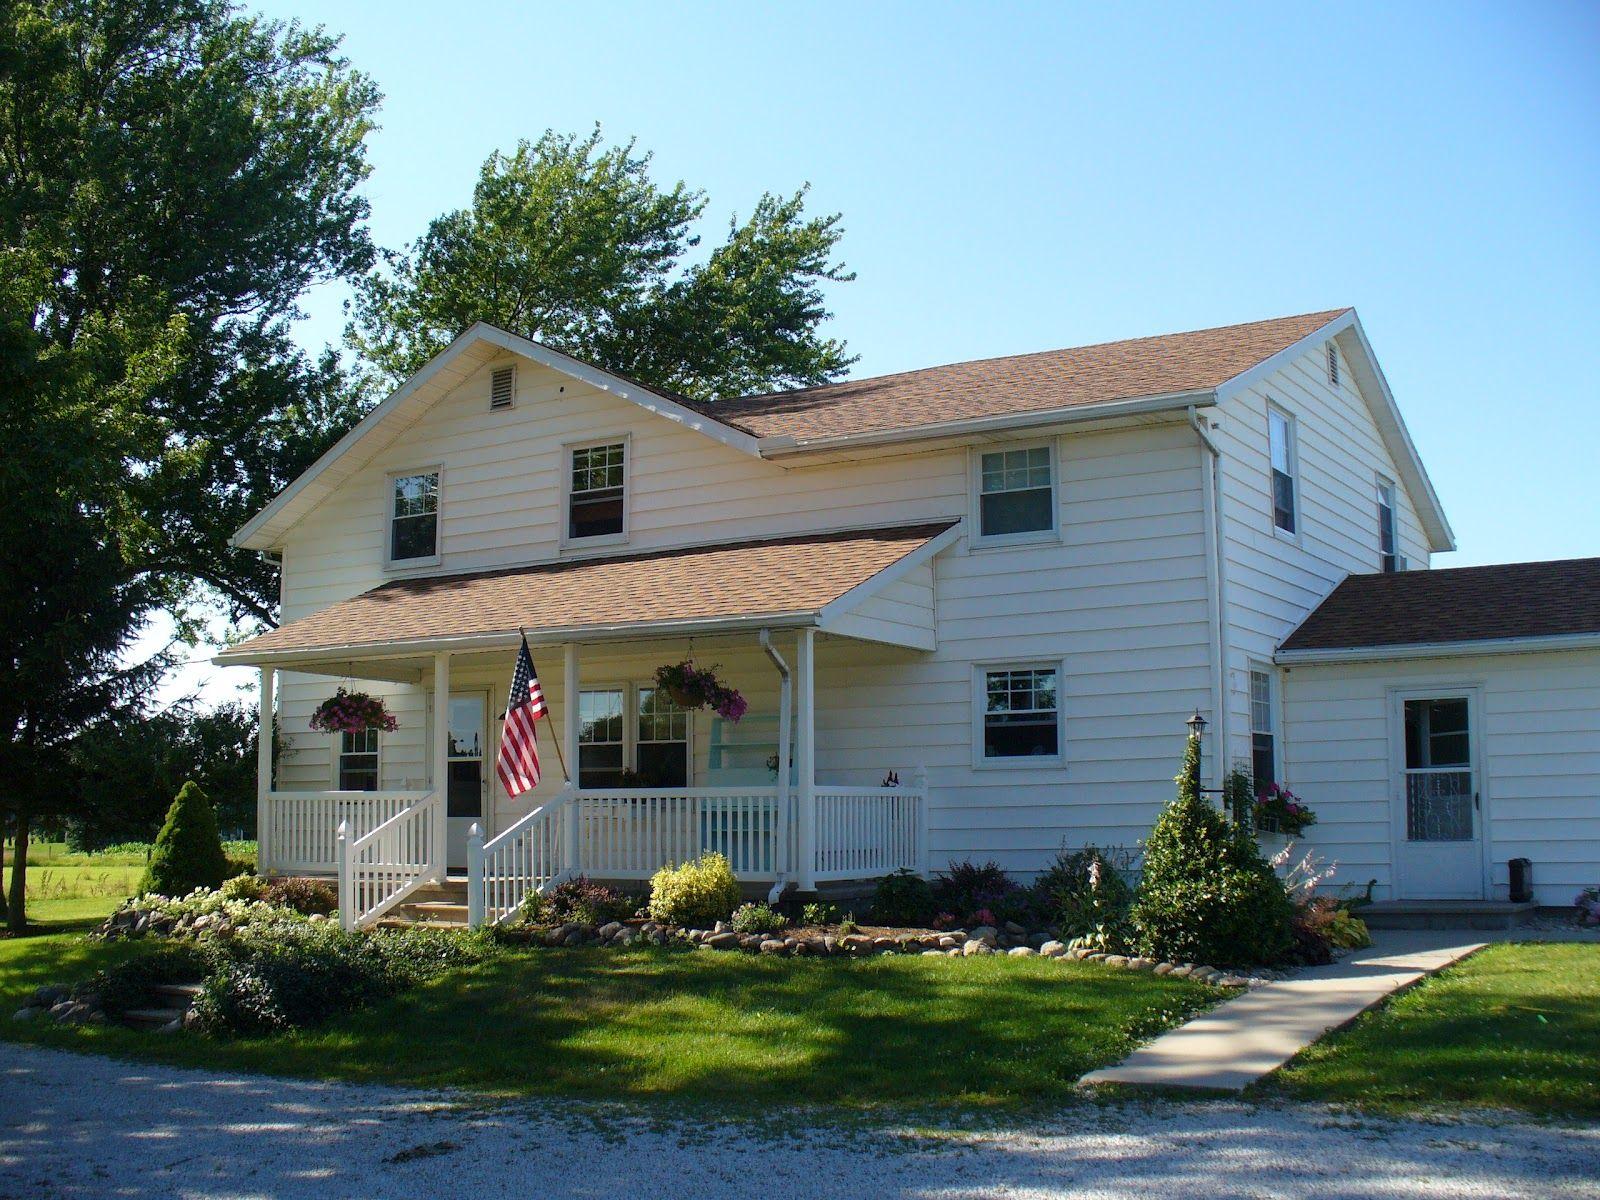 Cream Siding Trim Facia Brown Orange Roof Like Ours House Exterior Exterior House Colors Roof Colors